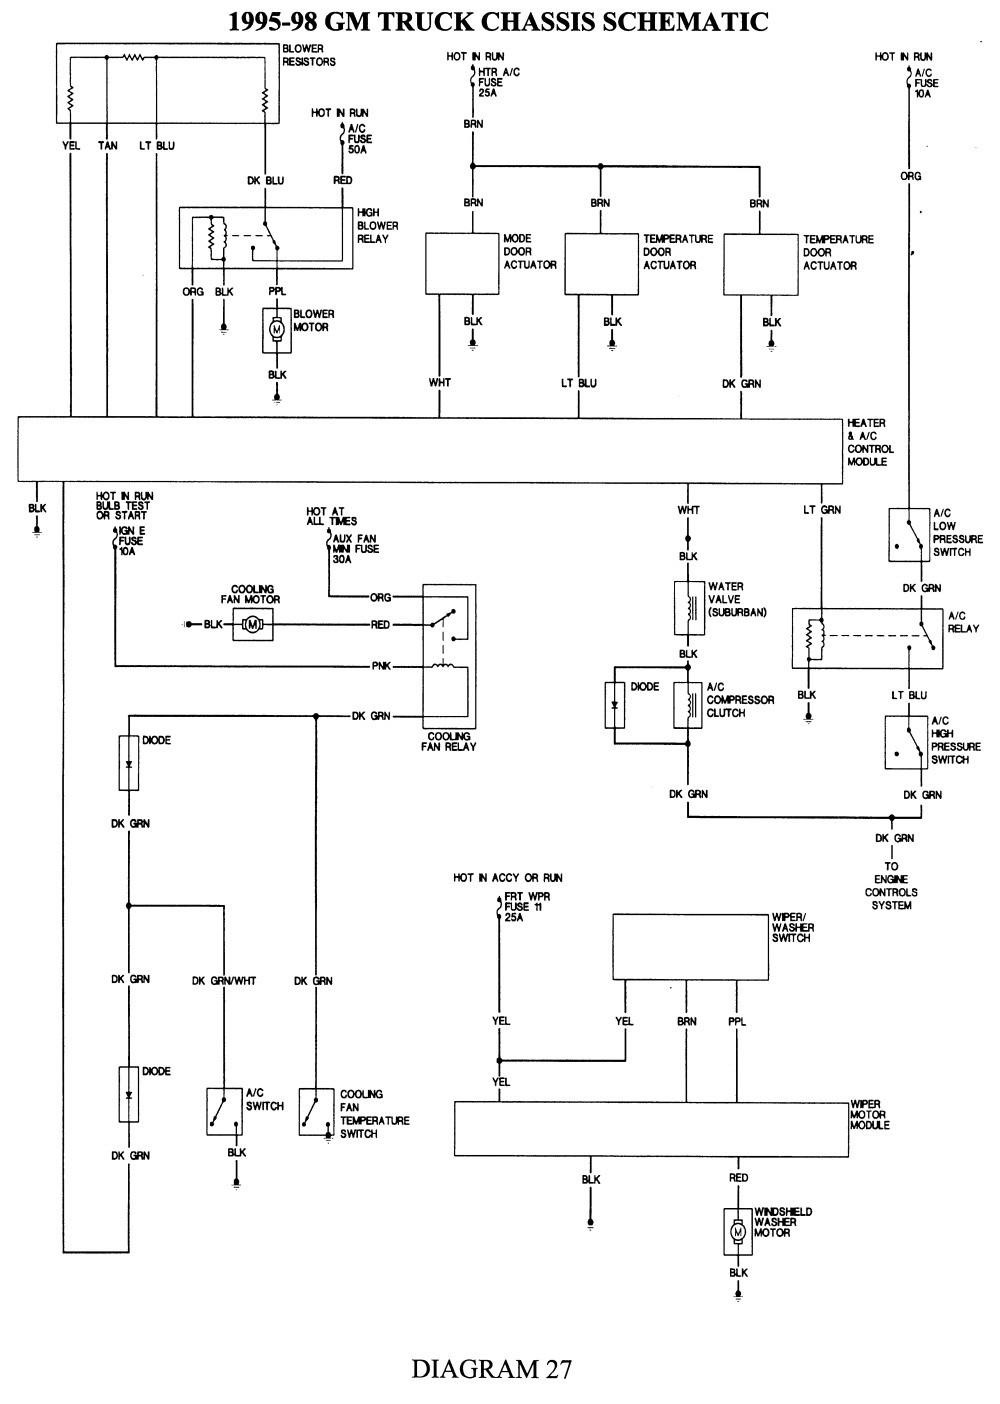 1988 Diagram Wiring Evinrude Be120tlcca